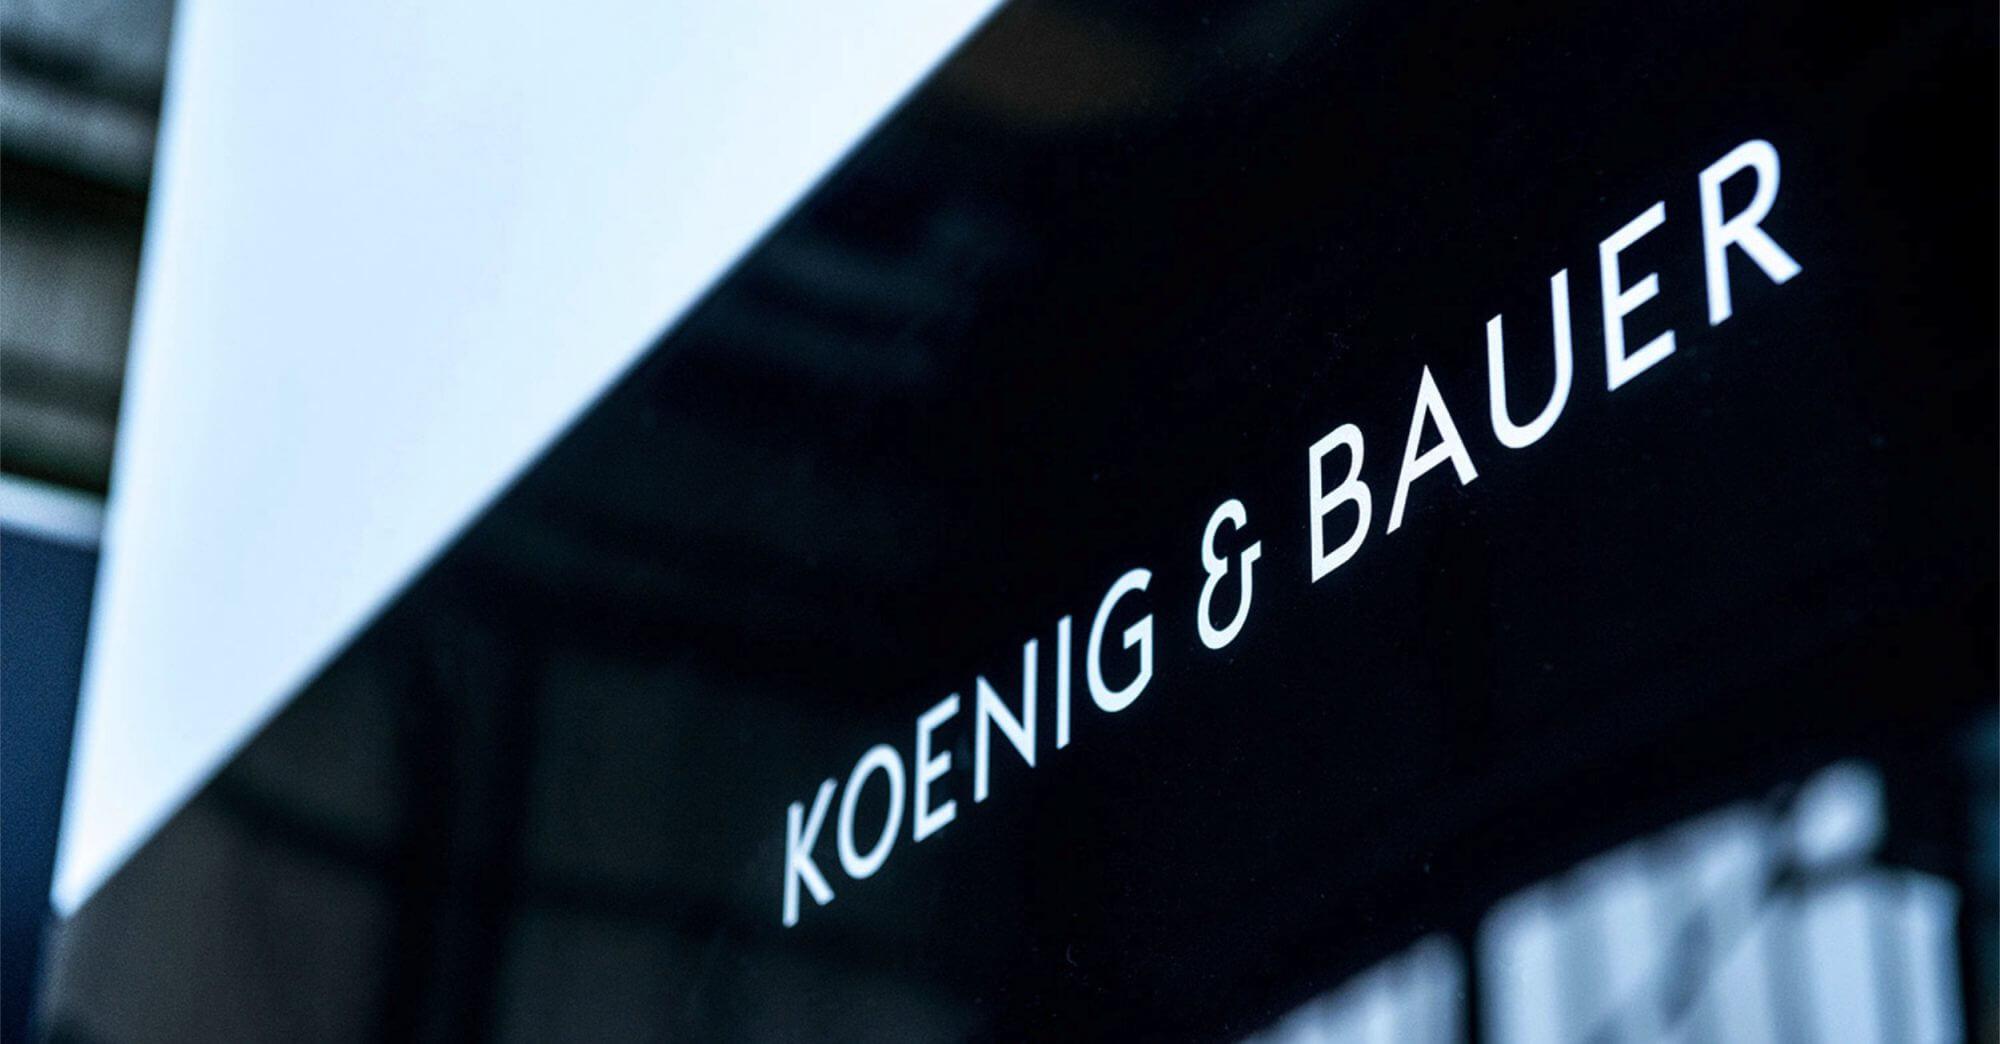 Koenig & Bauer Varijet Designsprache UX-Research UI Design Strategie Produktfamilie Innovation Tradition